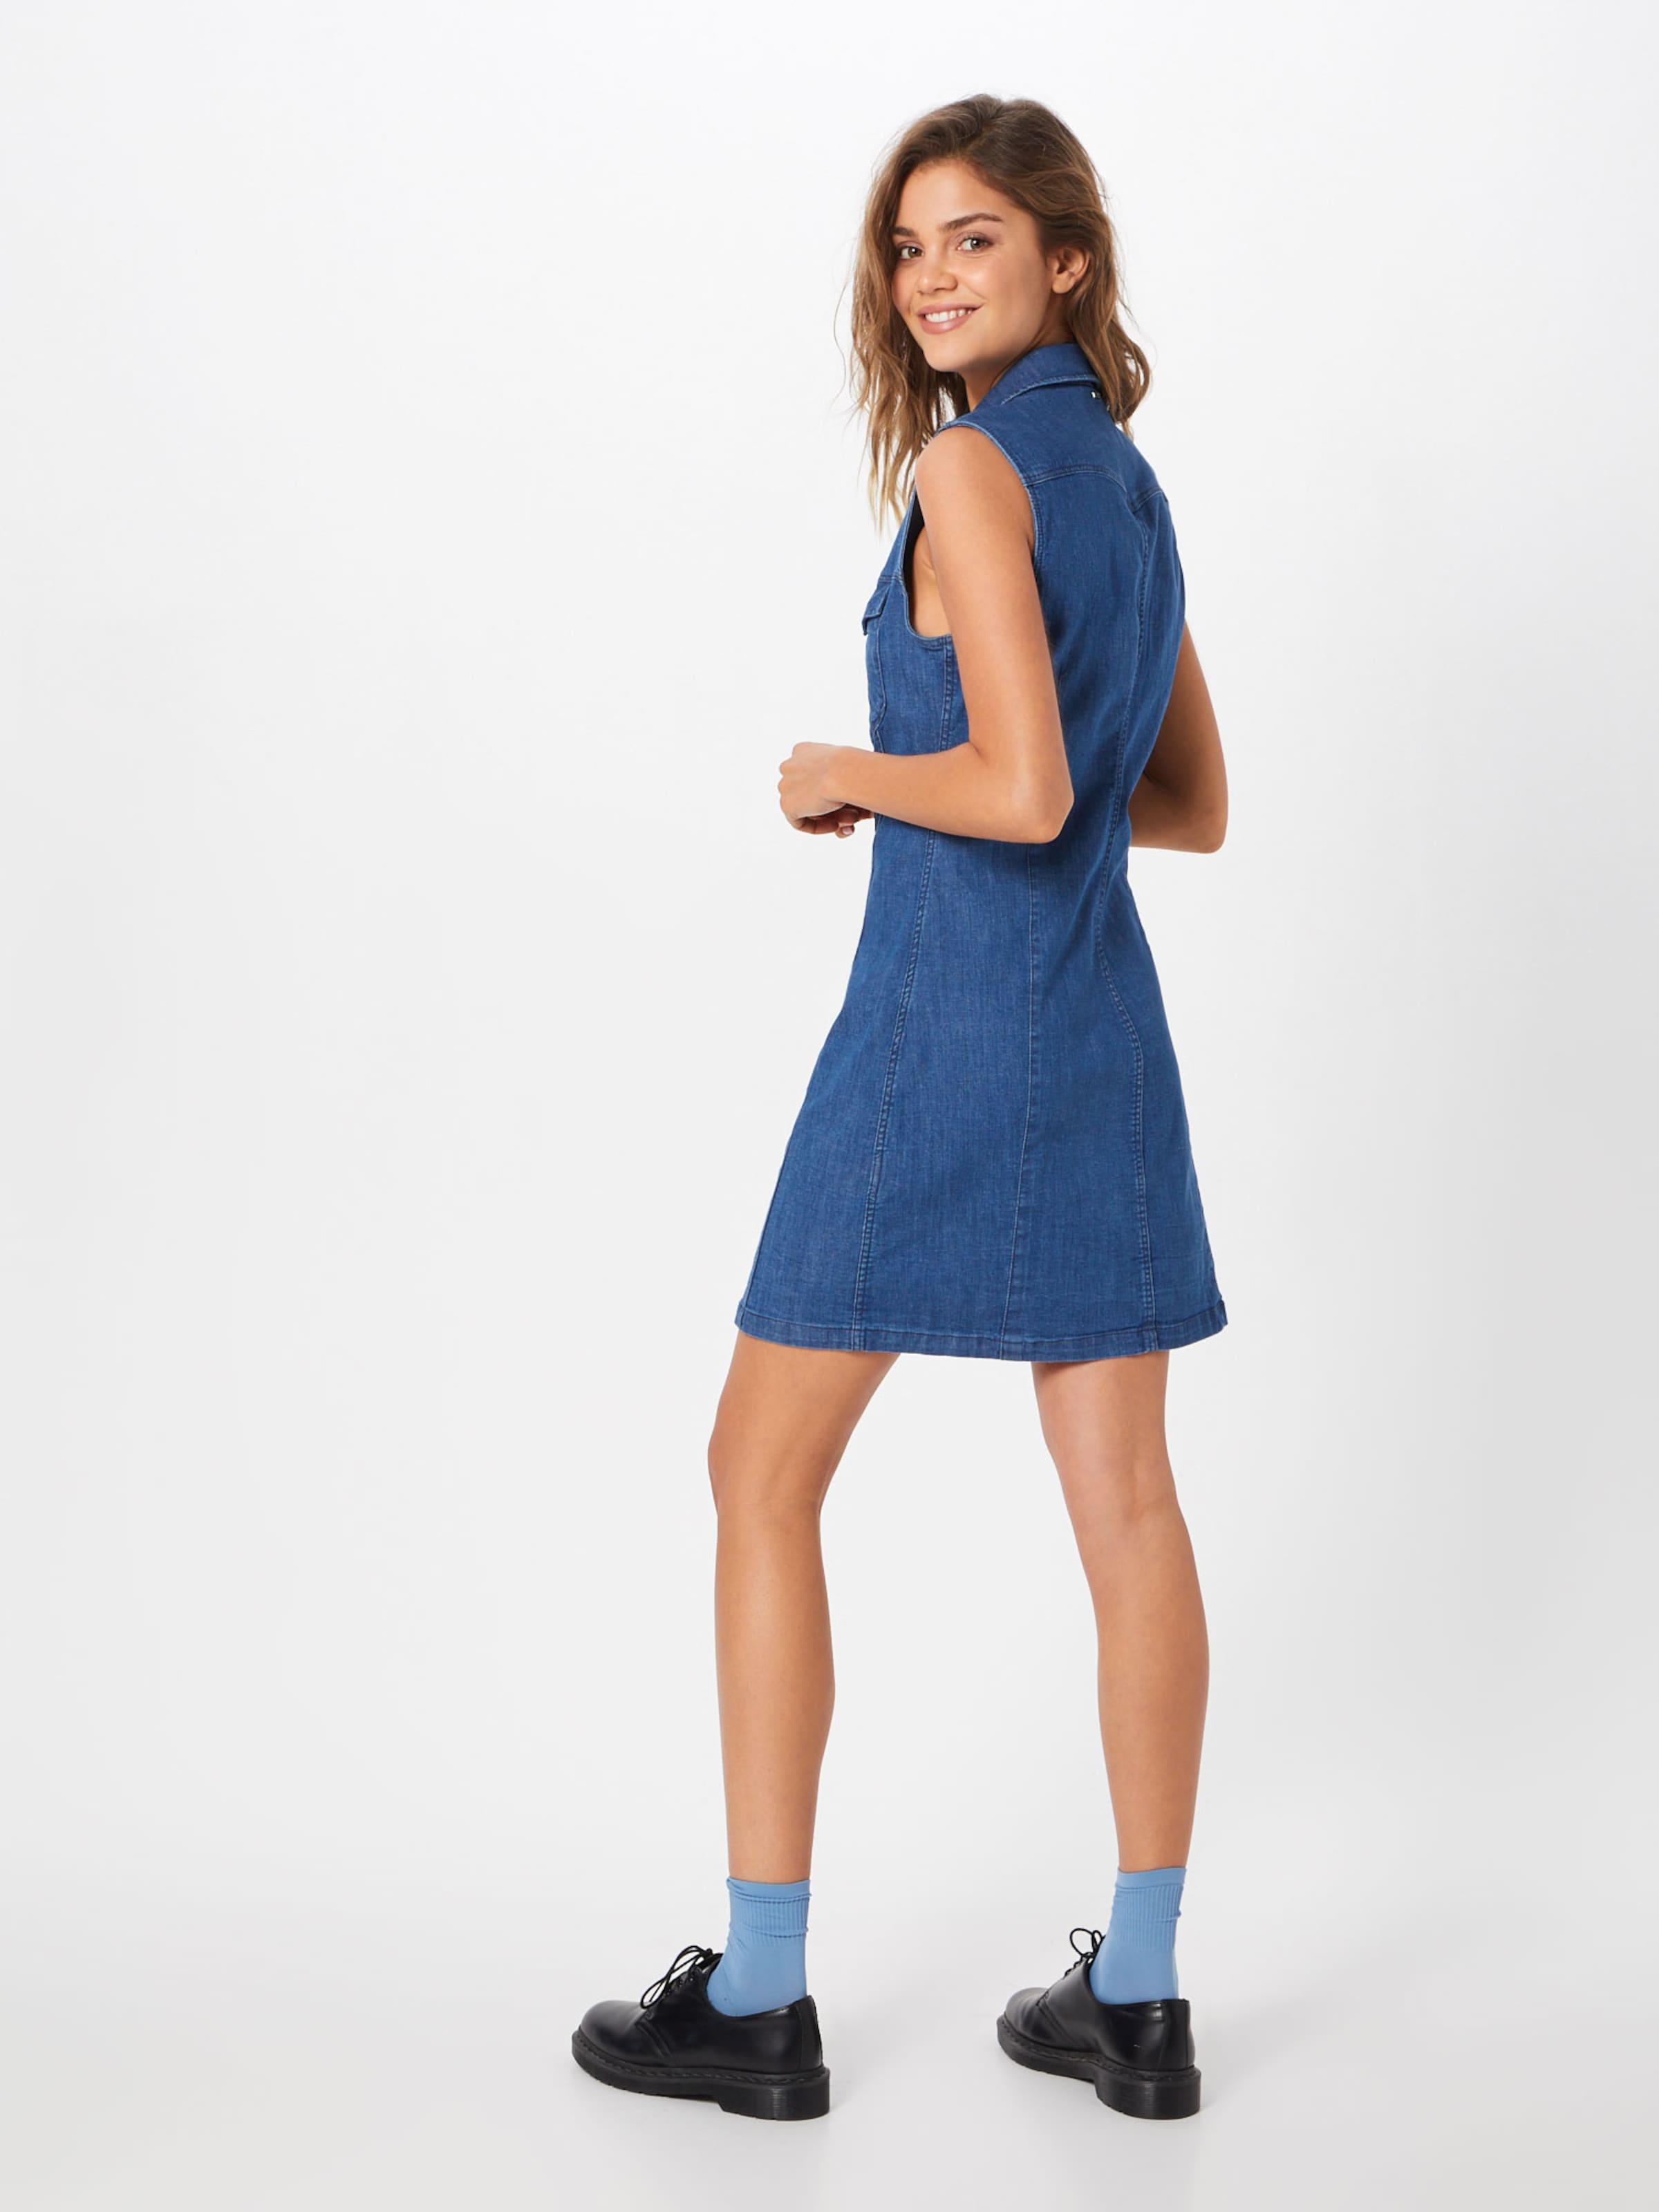 Kleider Sless' 'tacoma G Denim Raw In Slim star Dress Blue FlJKT1c3